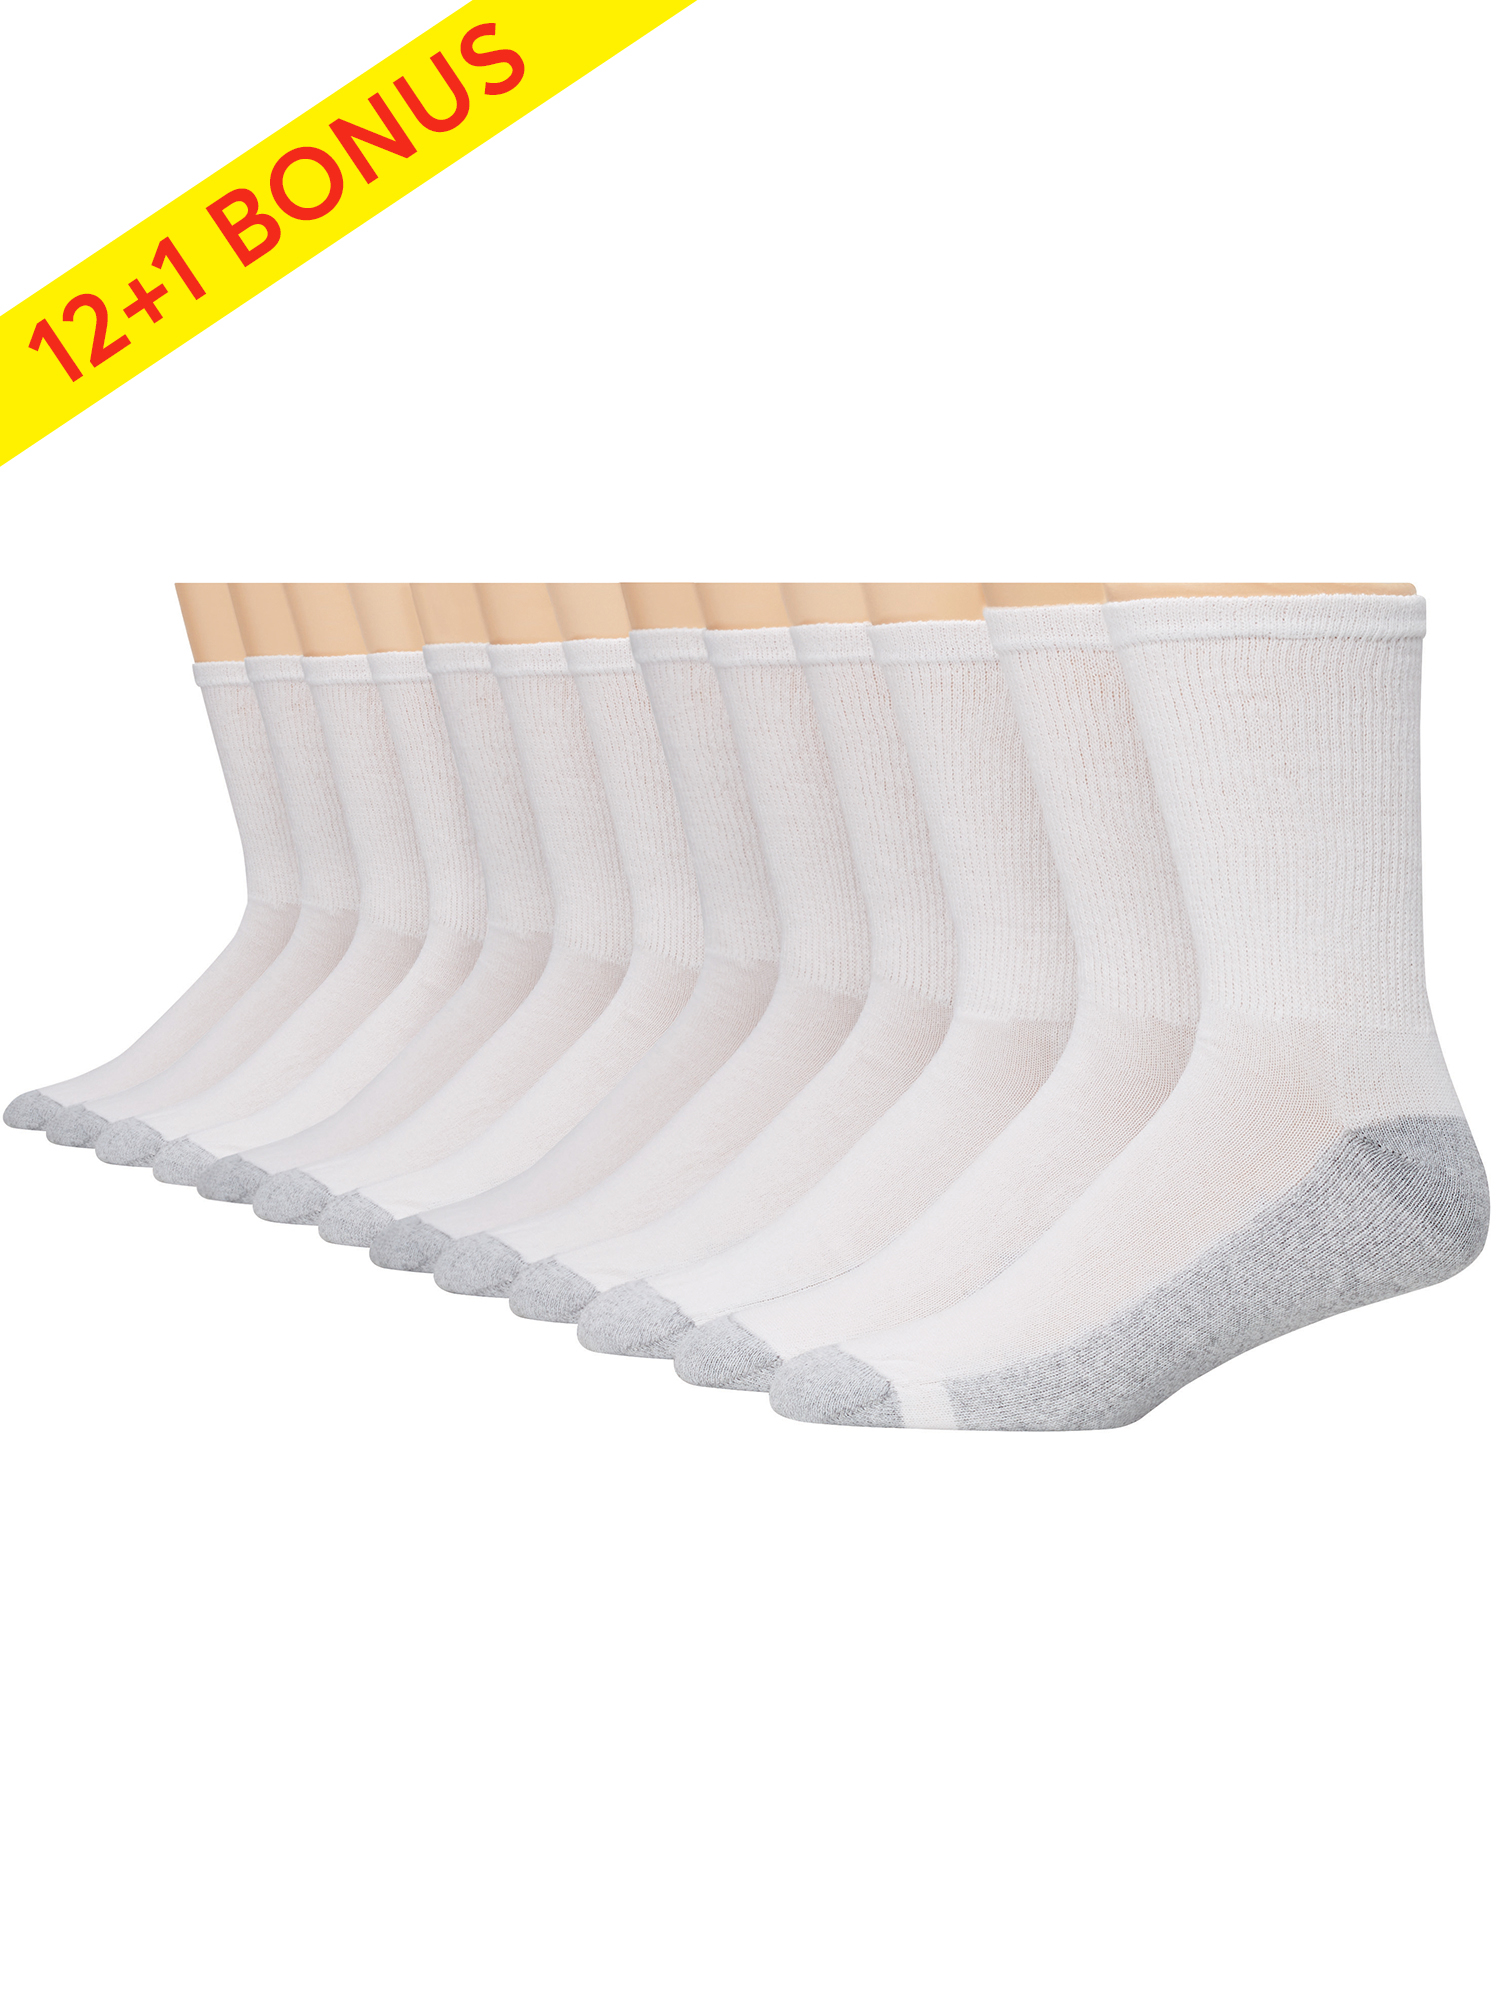 Hanes 13-Pack Low-Cut Socks Men/'s Cushion Bonus Durable Comfort toe Cushioned